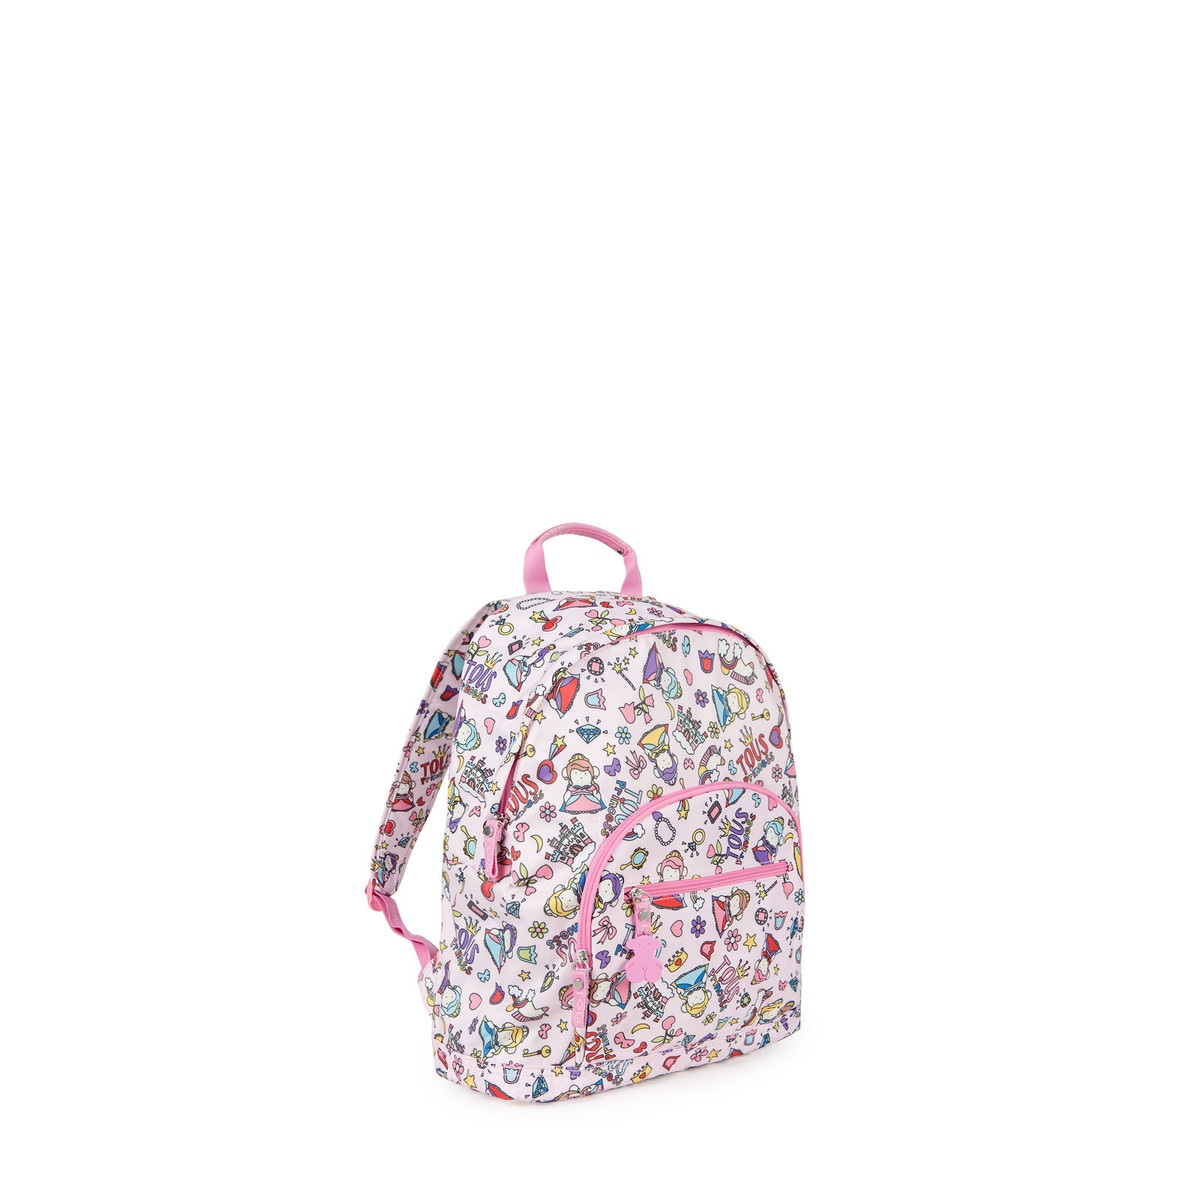 San Francisco 3bba2 e2baa Small pink-multicolored Canvas School Princess Backpack